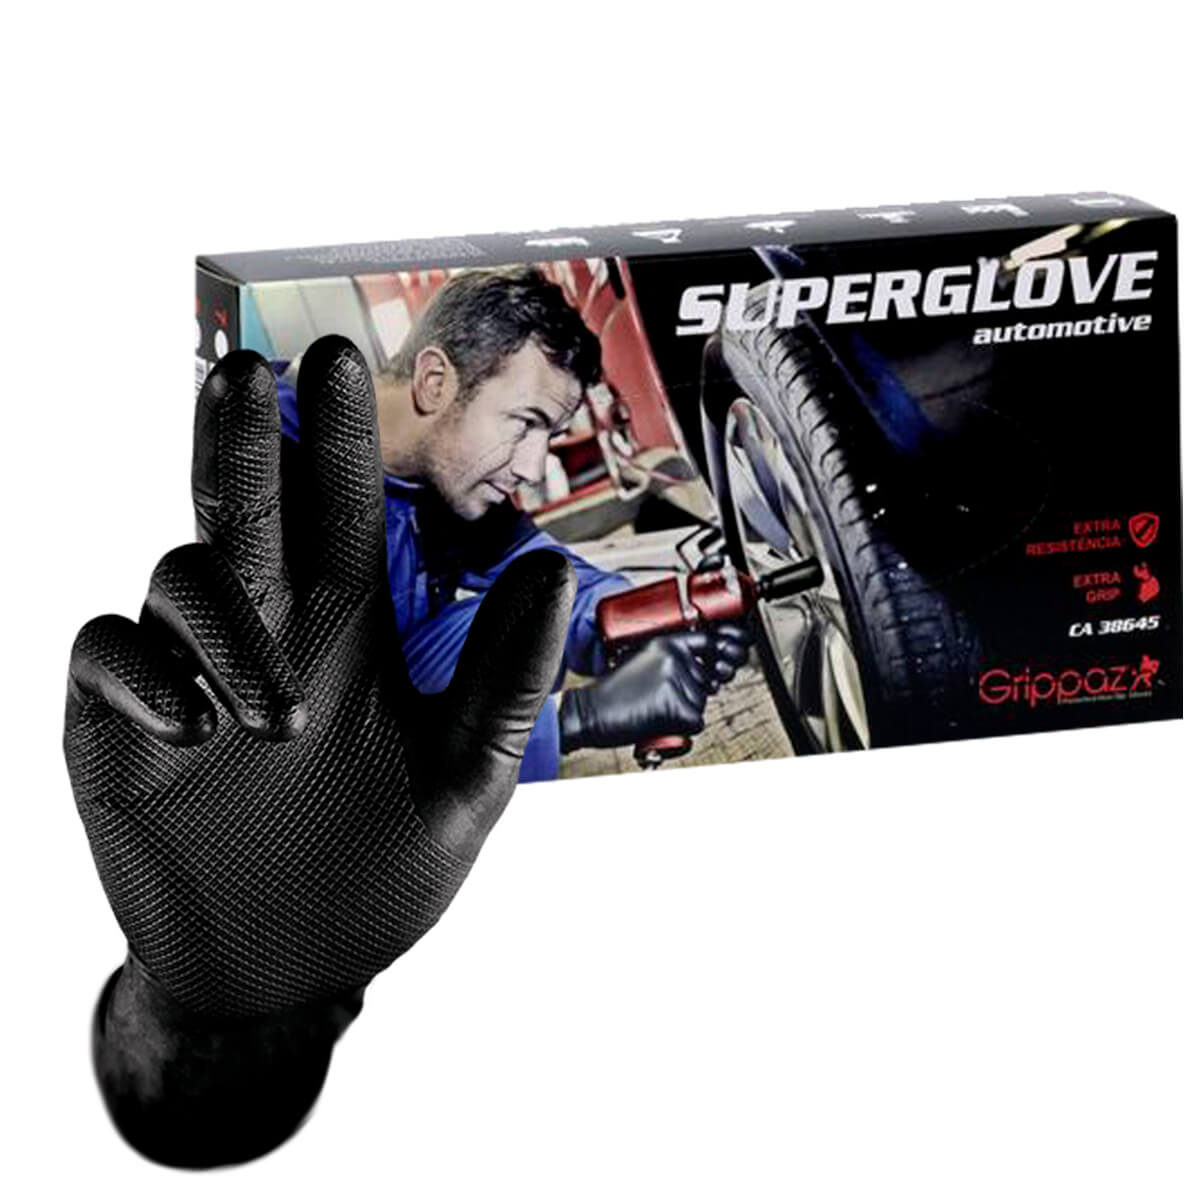 Caixa 50 Unidades Luva De Segurança Nitrilica Sem Pó Super Glove